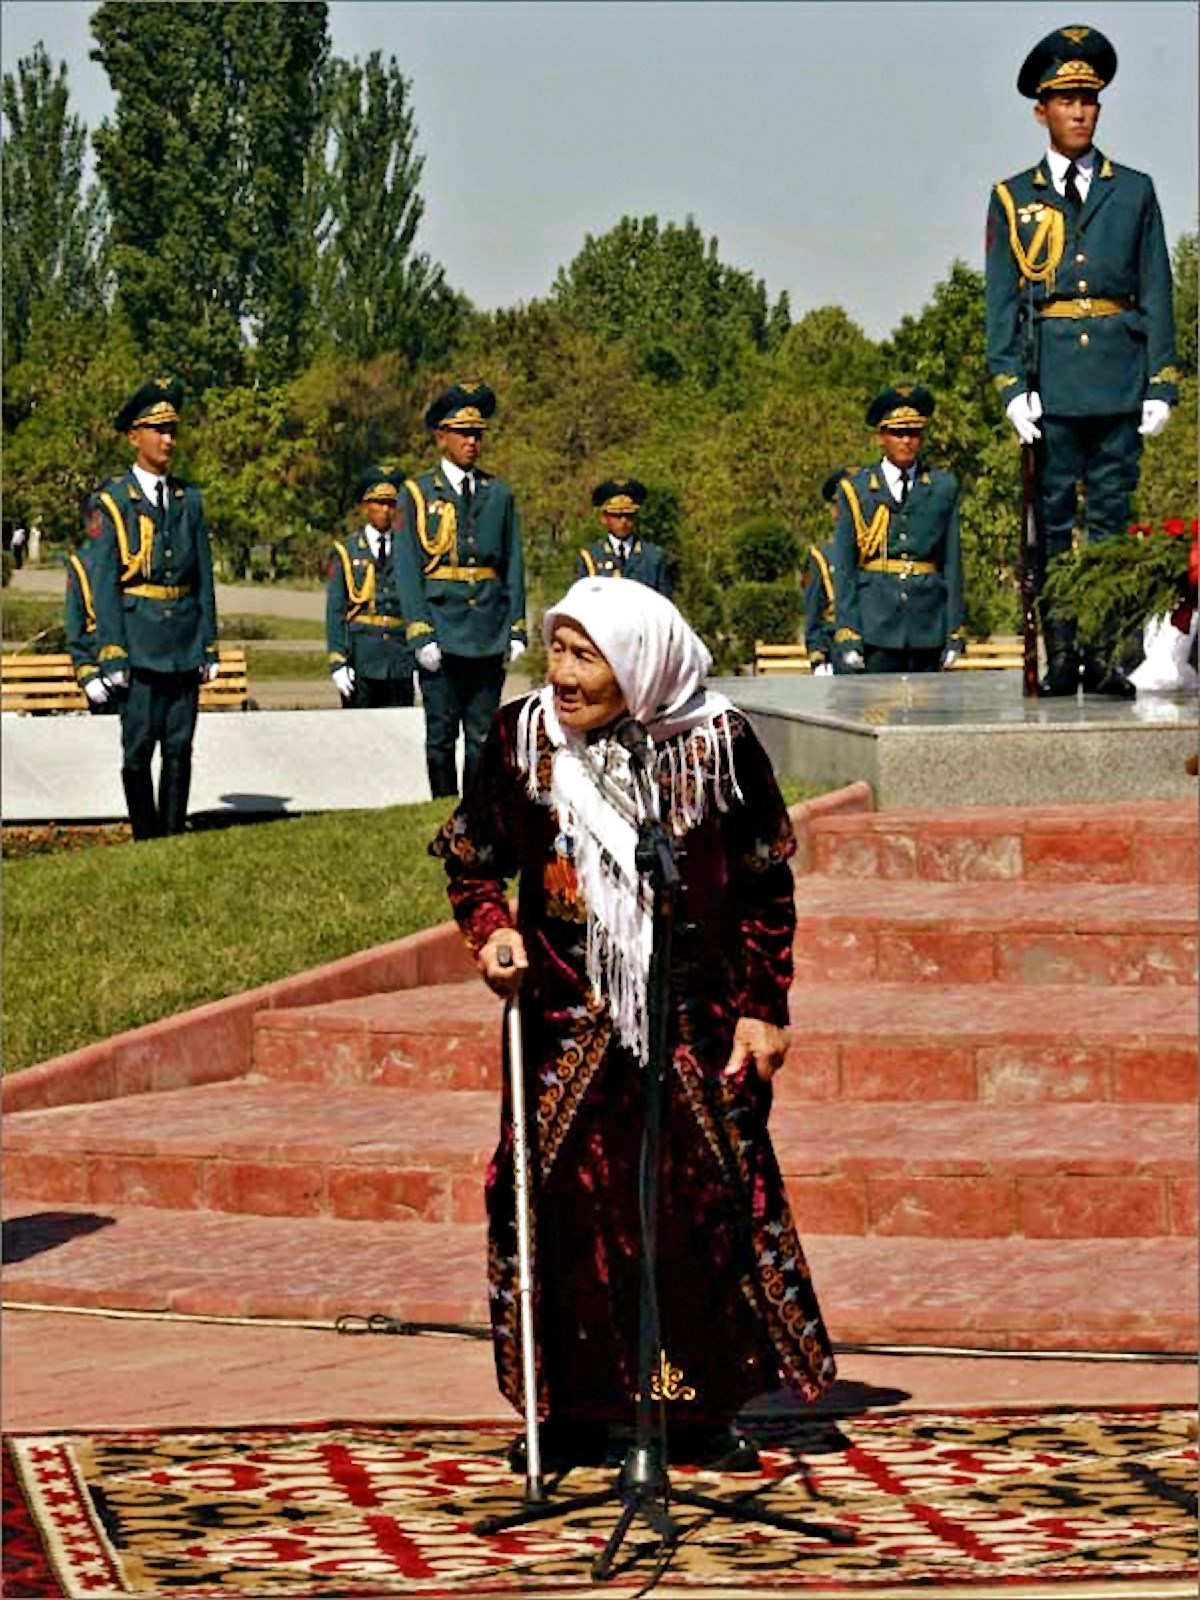 00 Toktogon Altybasarova. Kyrgyzstan. 180615